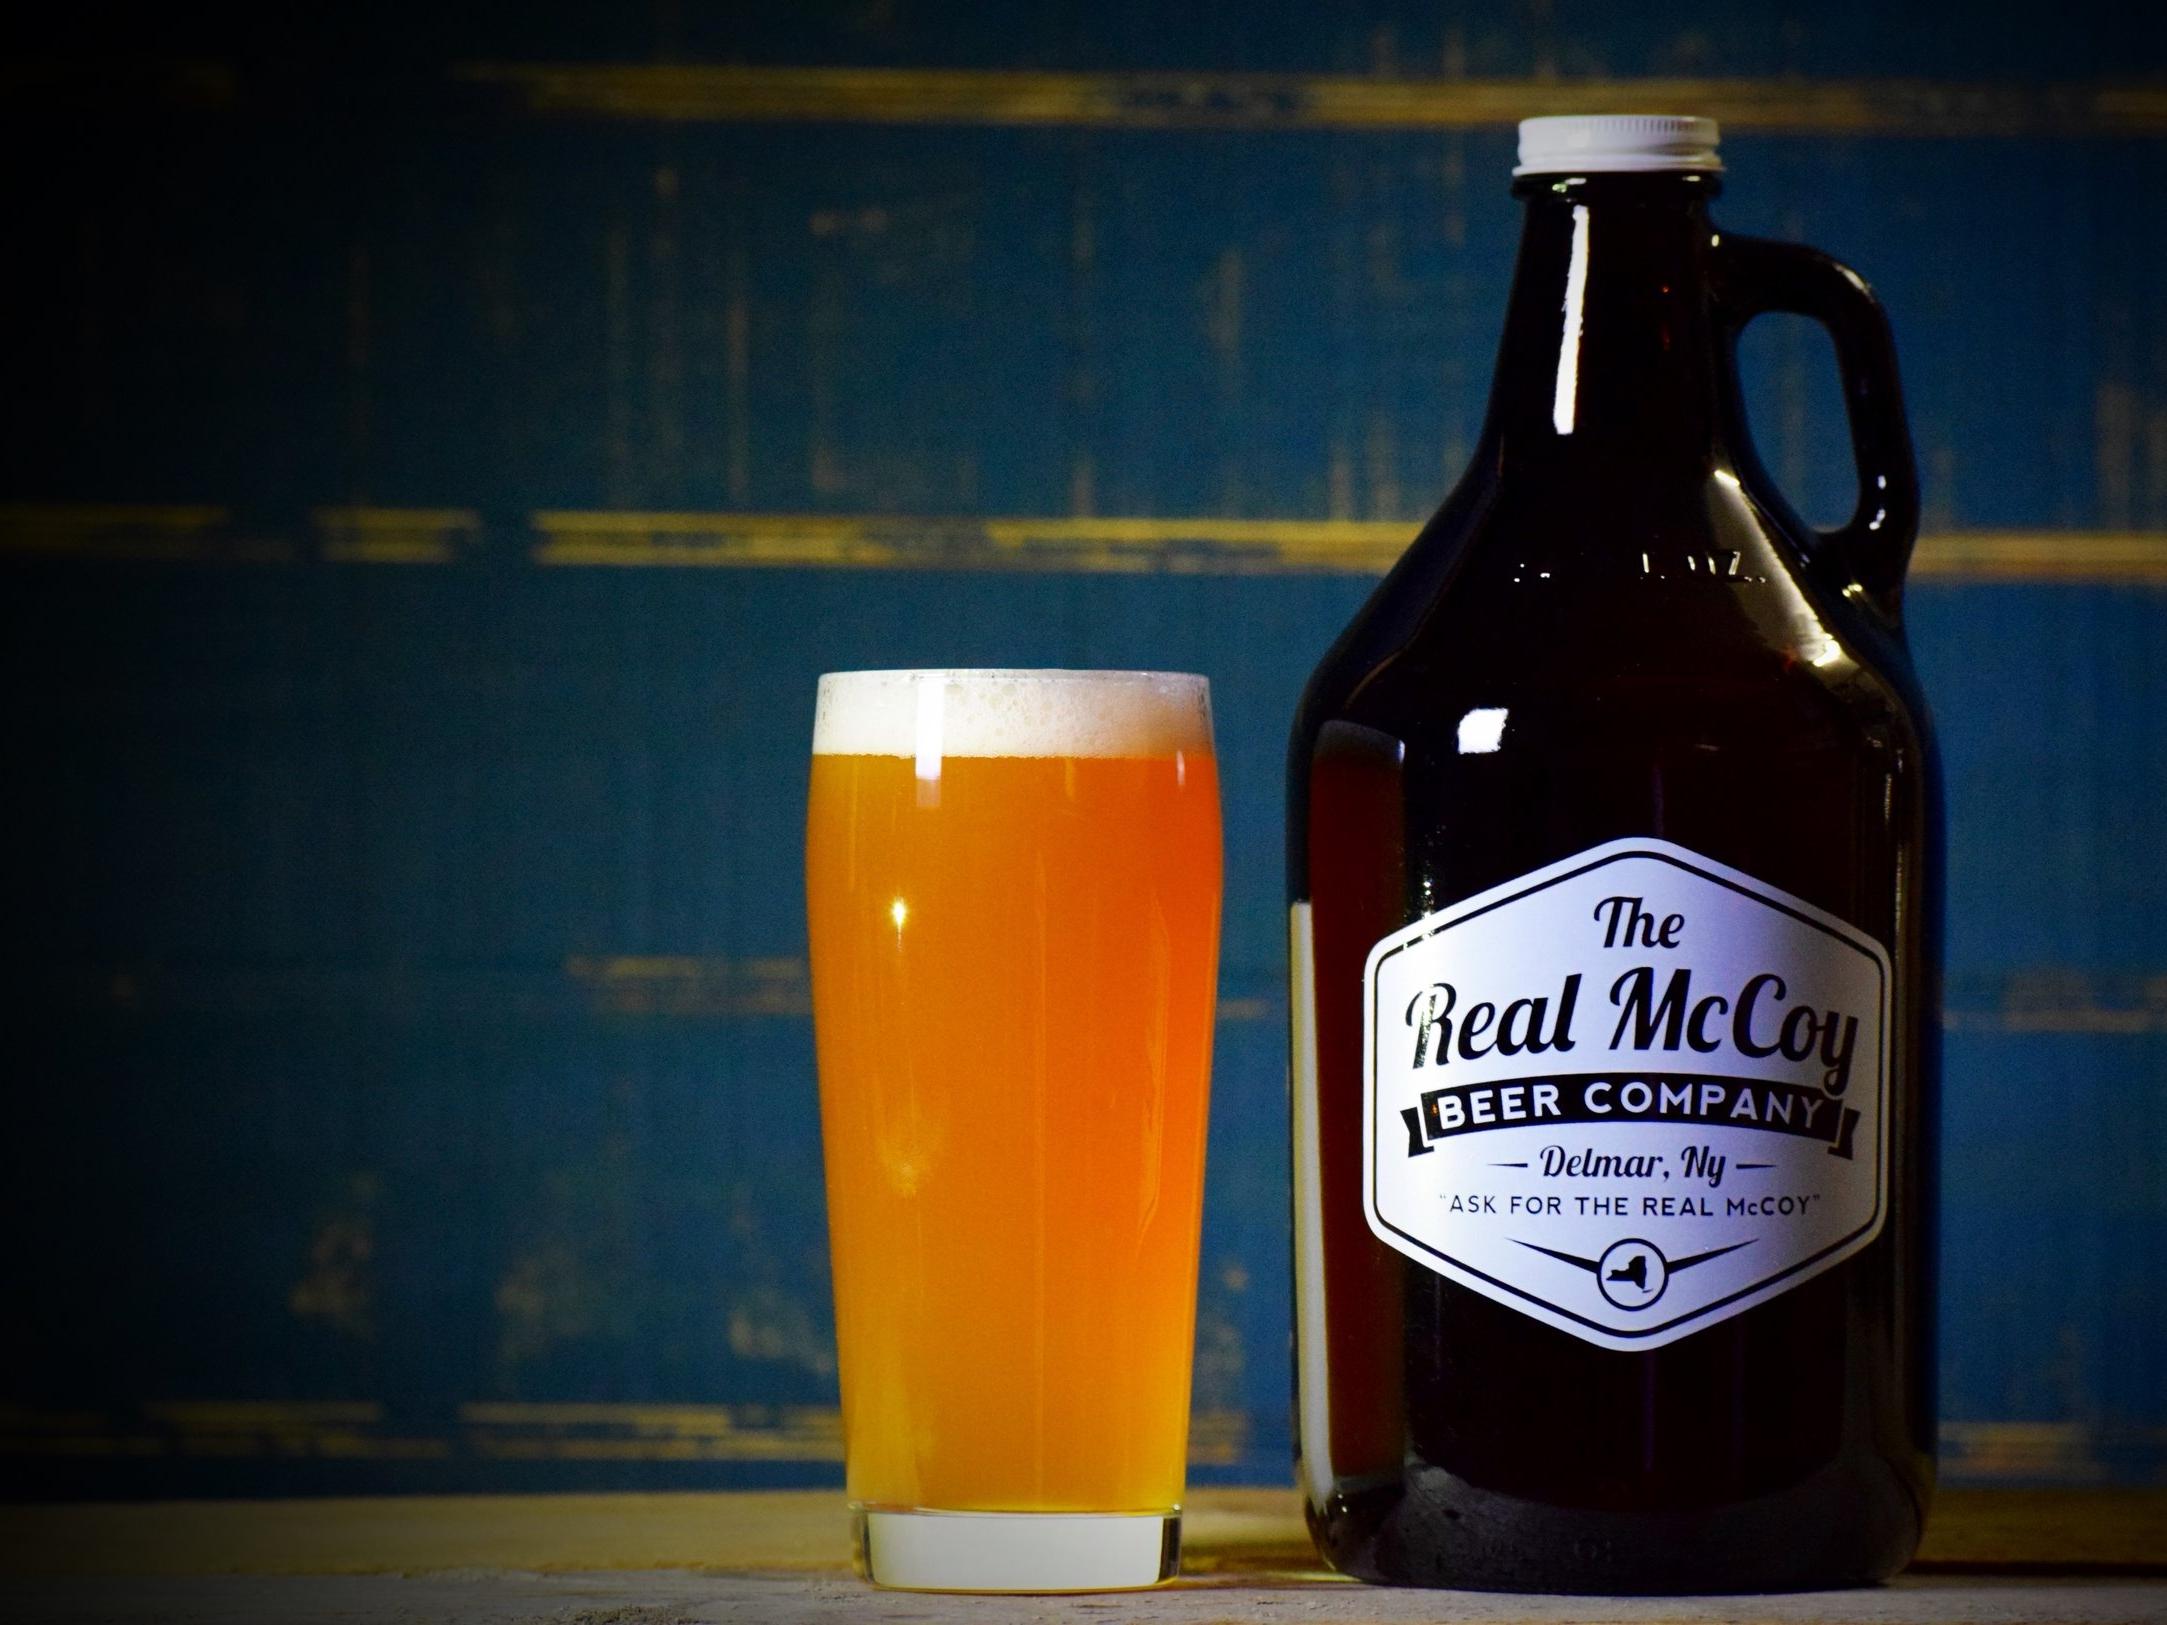 warehouse pale ale.JPG